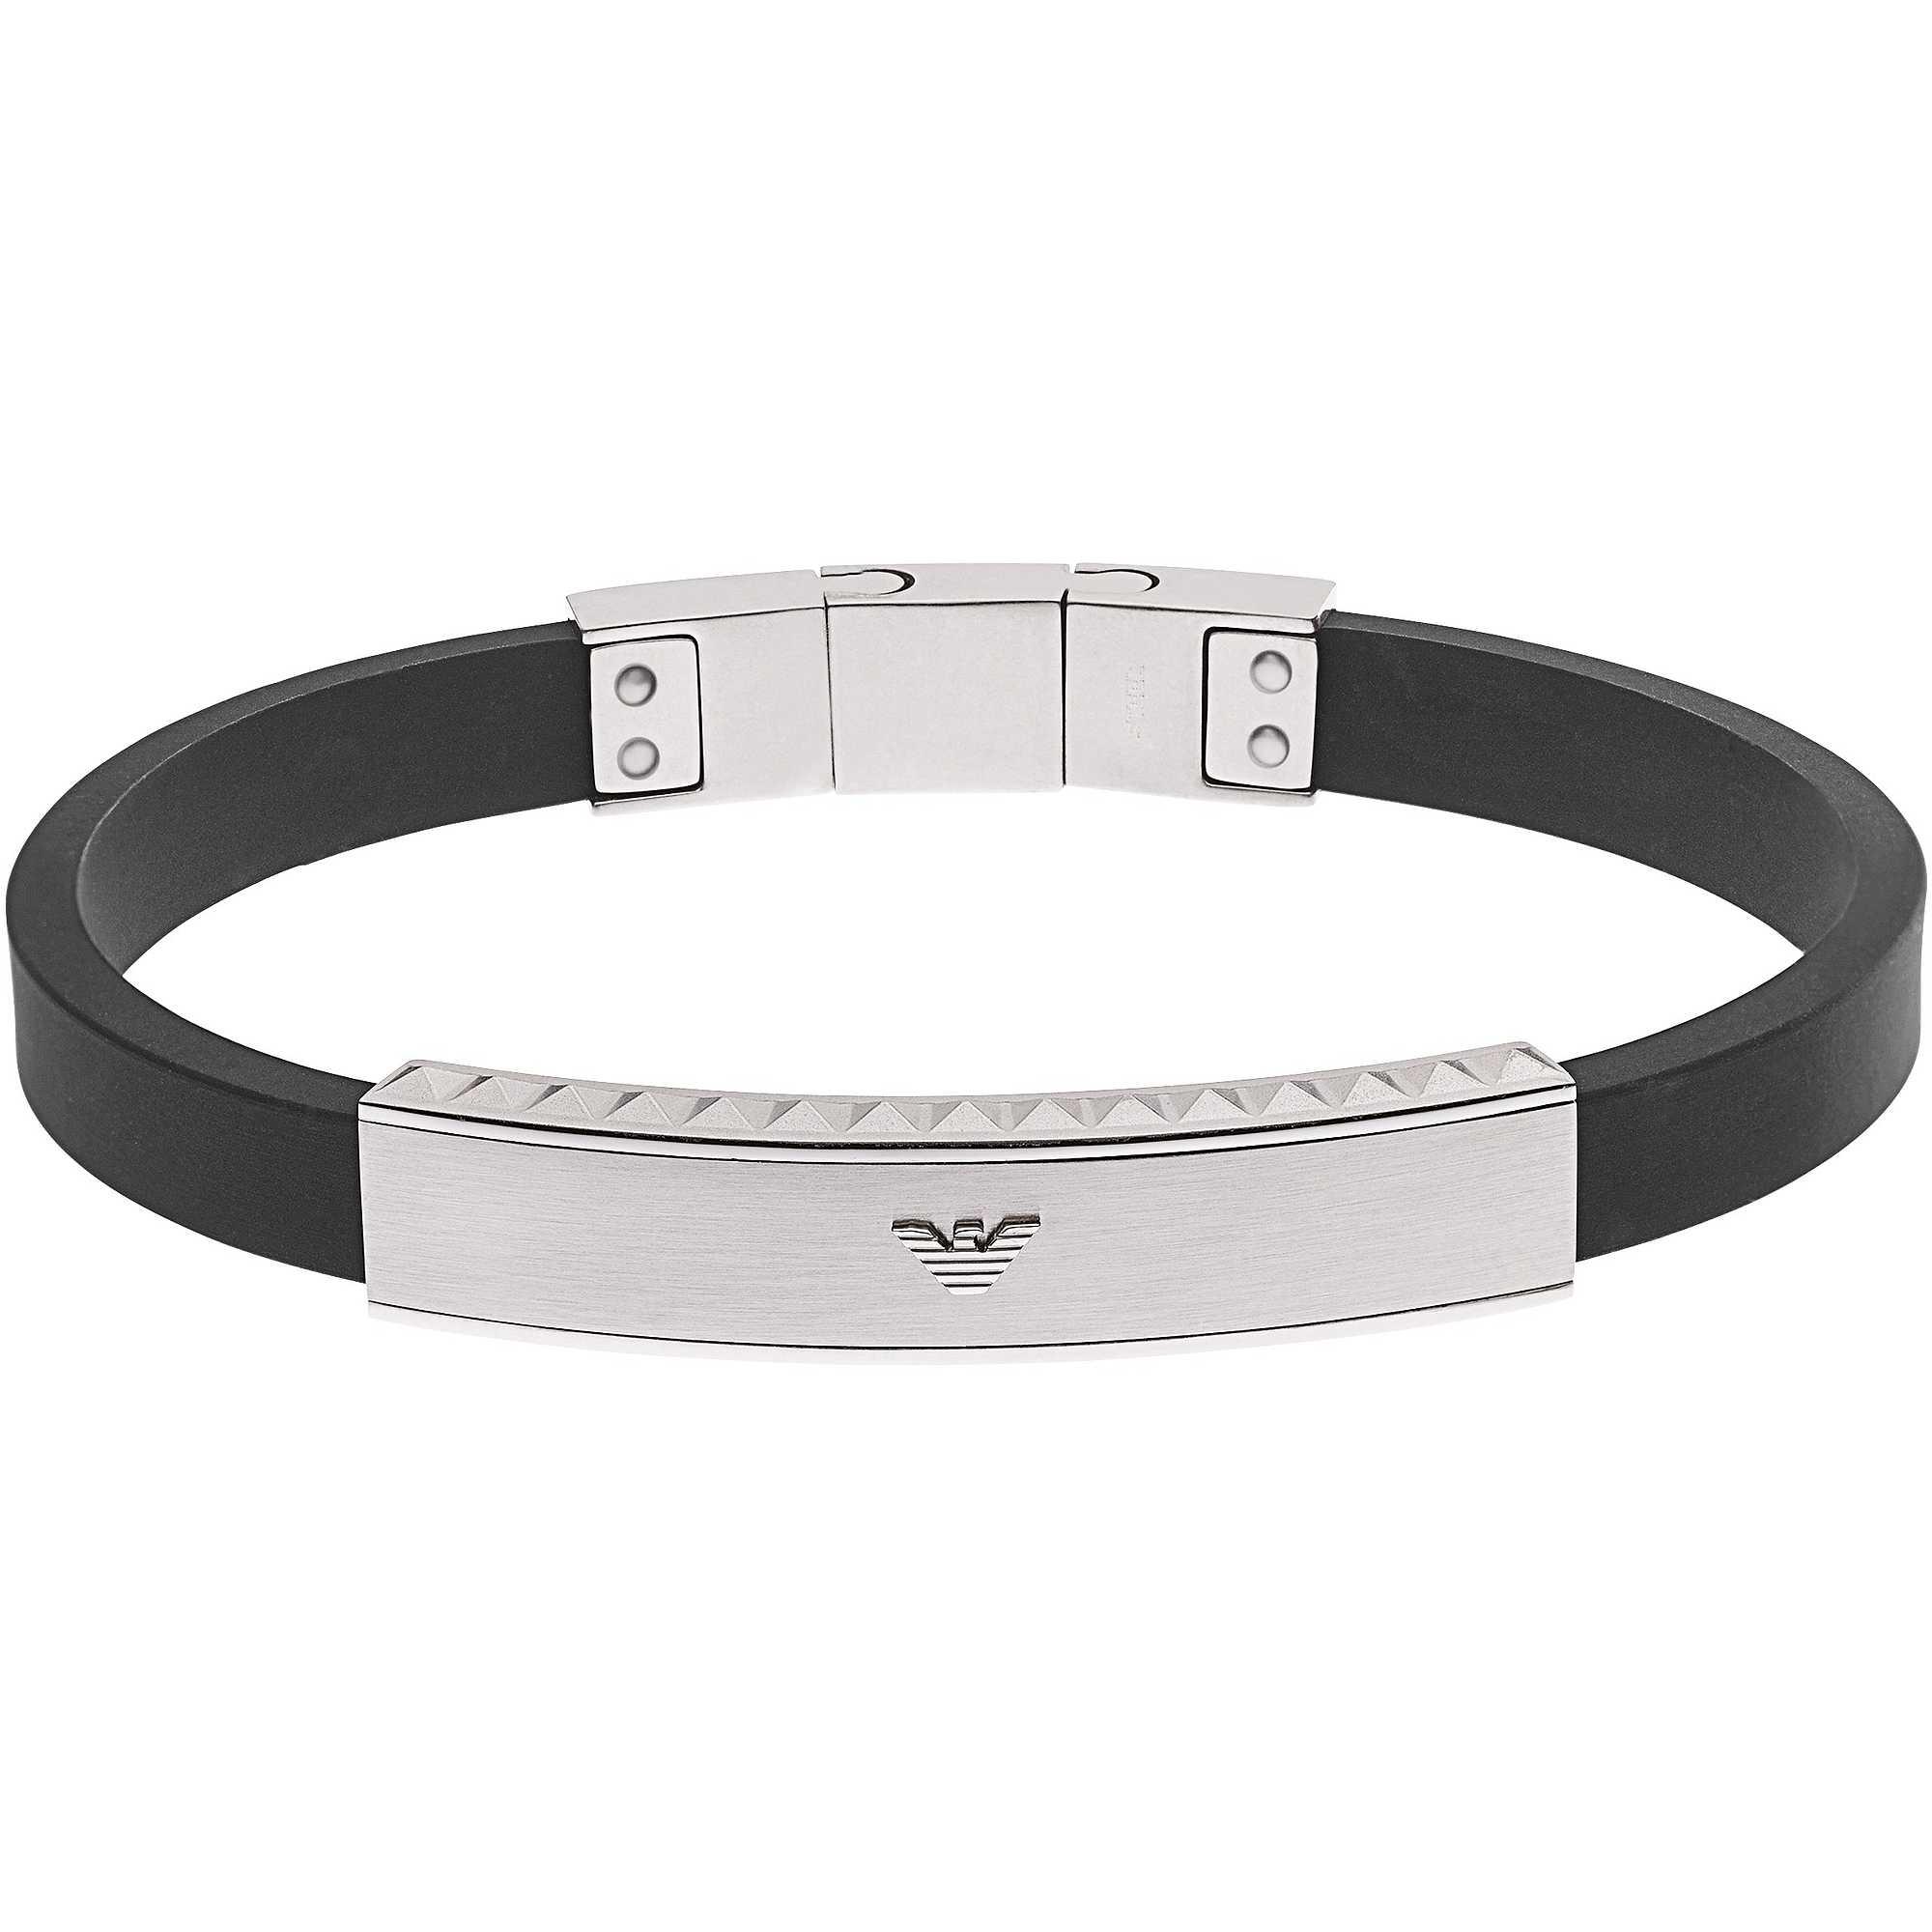 bracelet man jewellery Emporio Armani EGS1882040 bracelets Emporio ... 95bb2621901